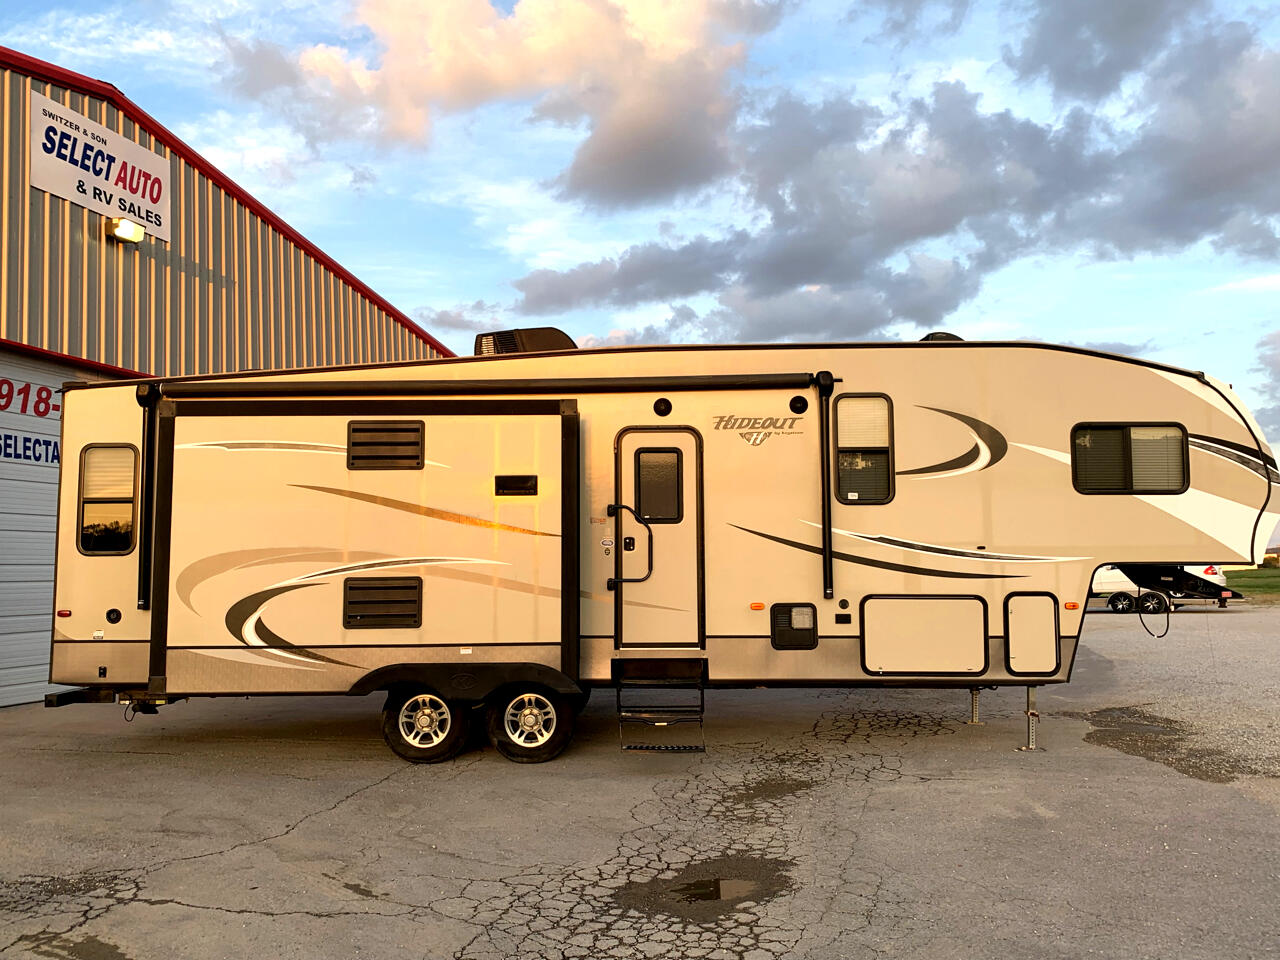 Rv Sales Tulsa >> Used 2017 Keystone Rv Hideout 299rlds For Sale In Tulsa Ok